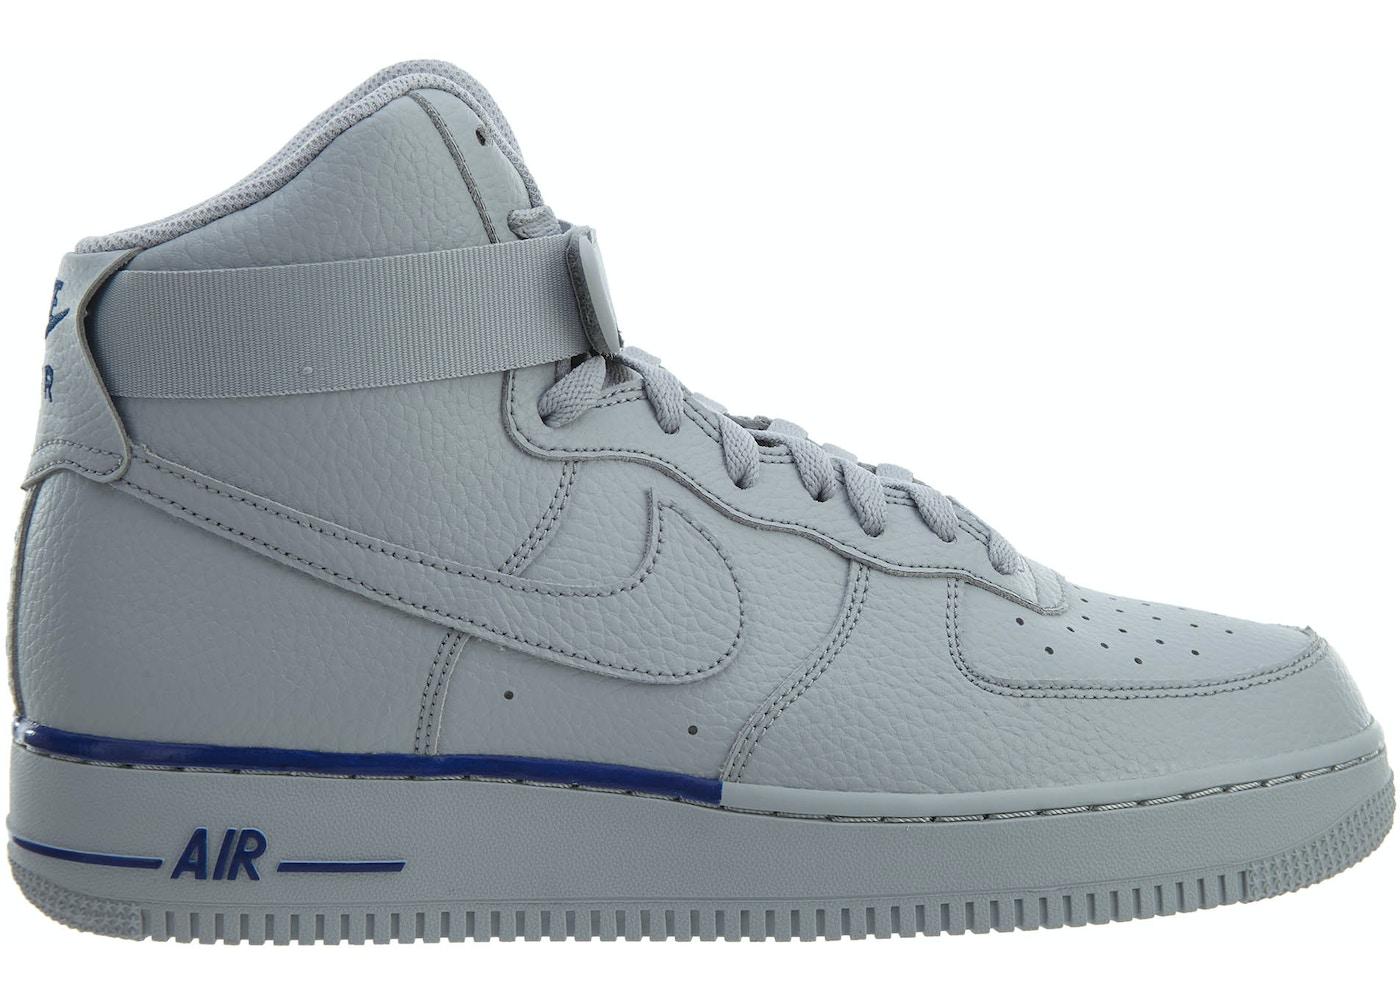 556ce50b01 Nike Shoes - Volatility